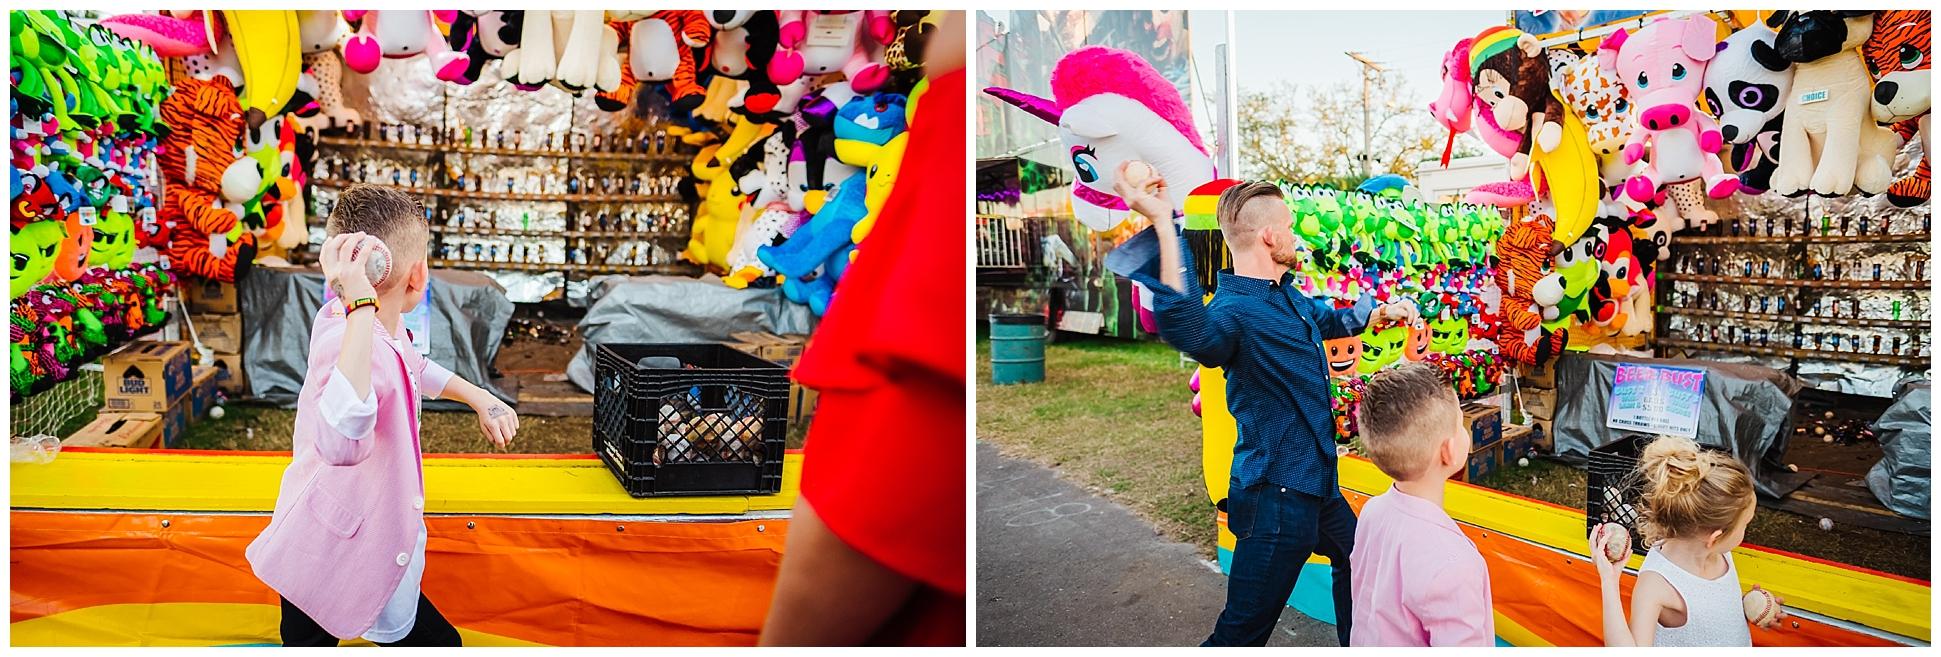 Tampa-colorful-fair-amusement park-family session_0033.jpg